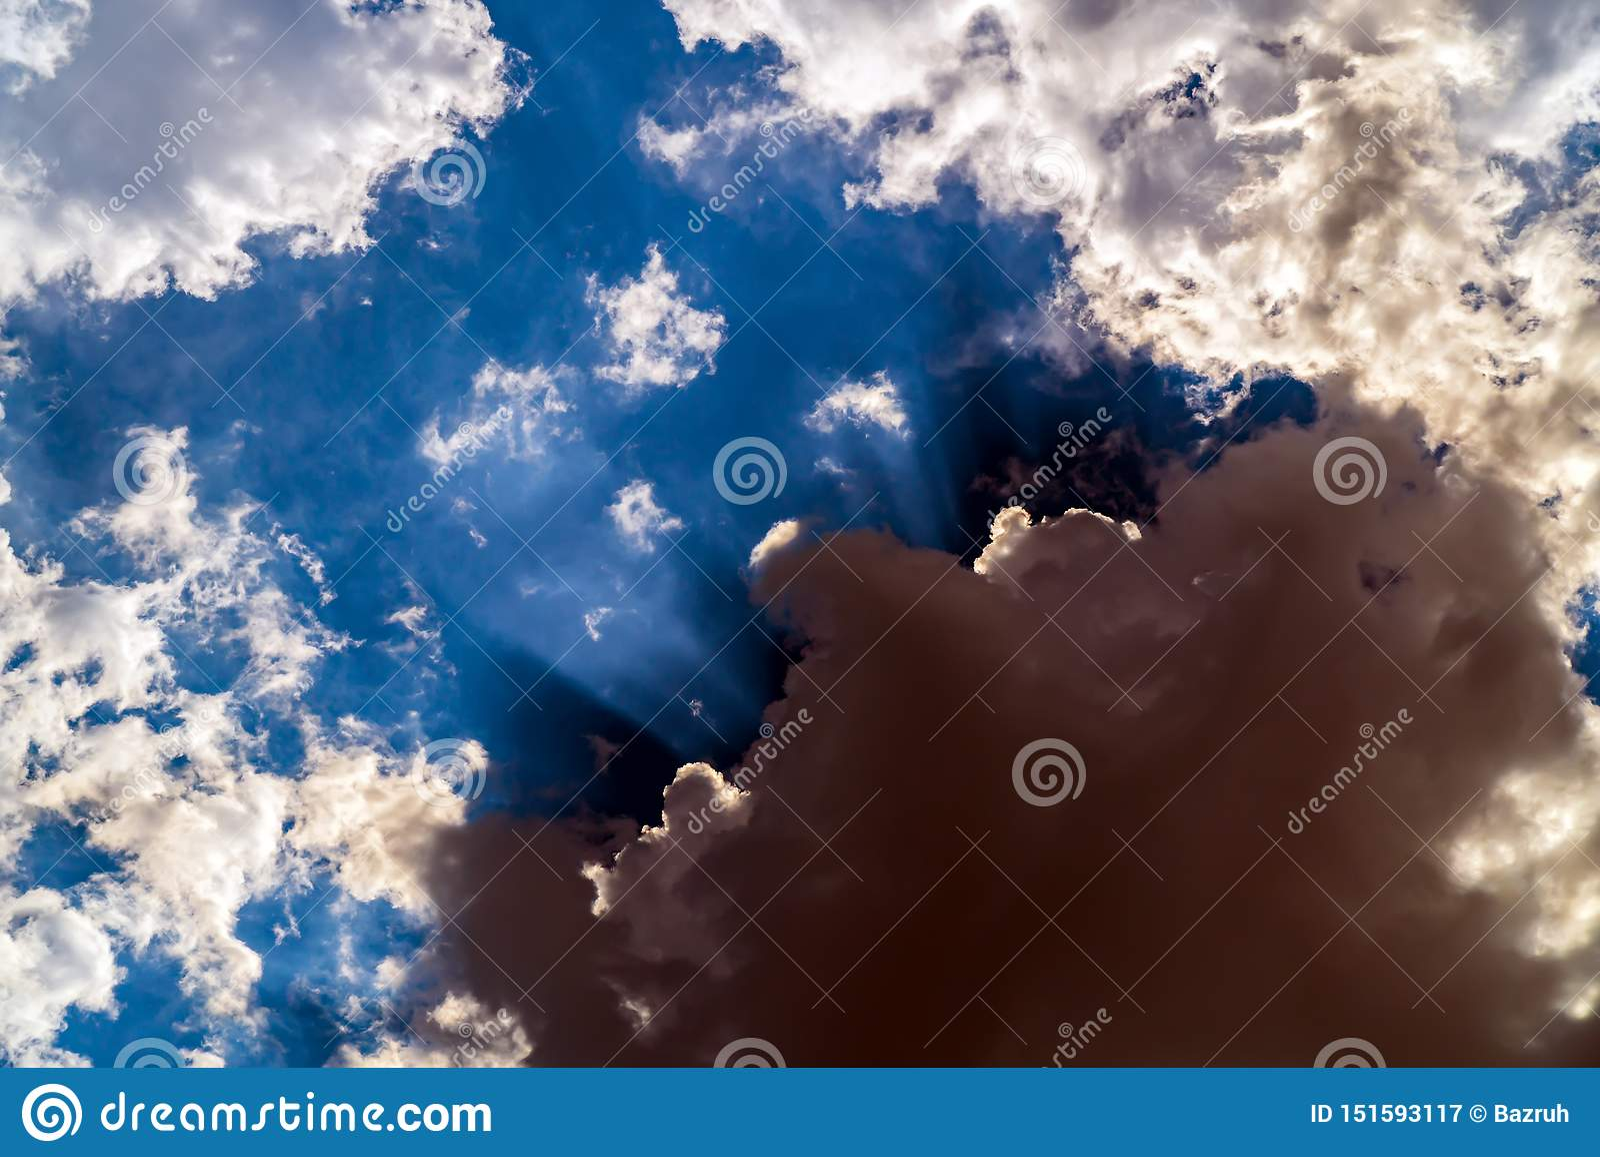 Dark storm clouds on a bright blue sky